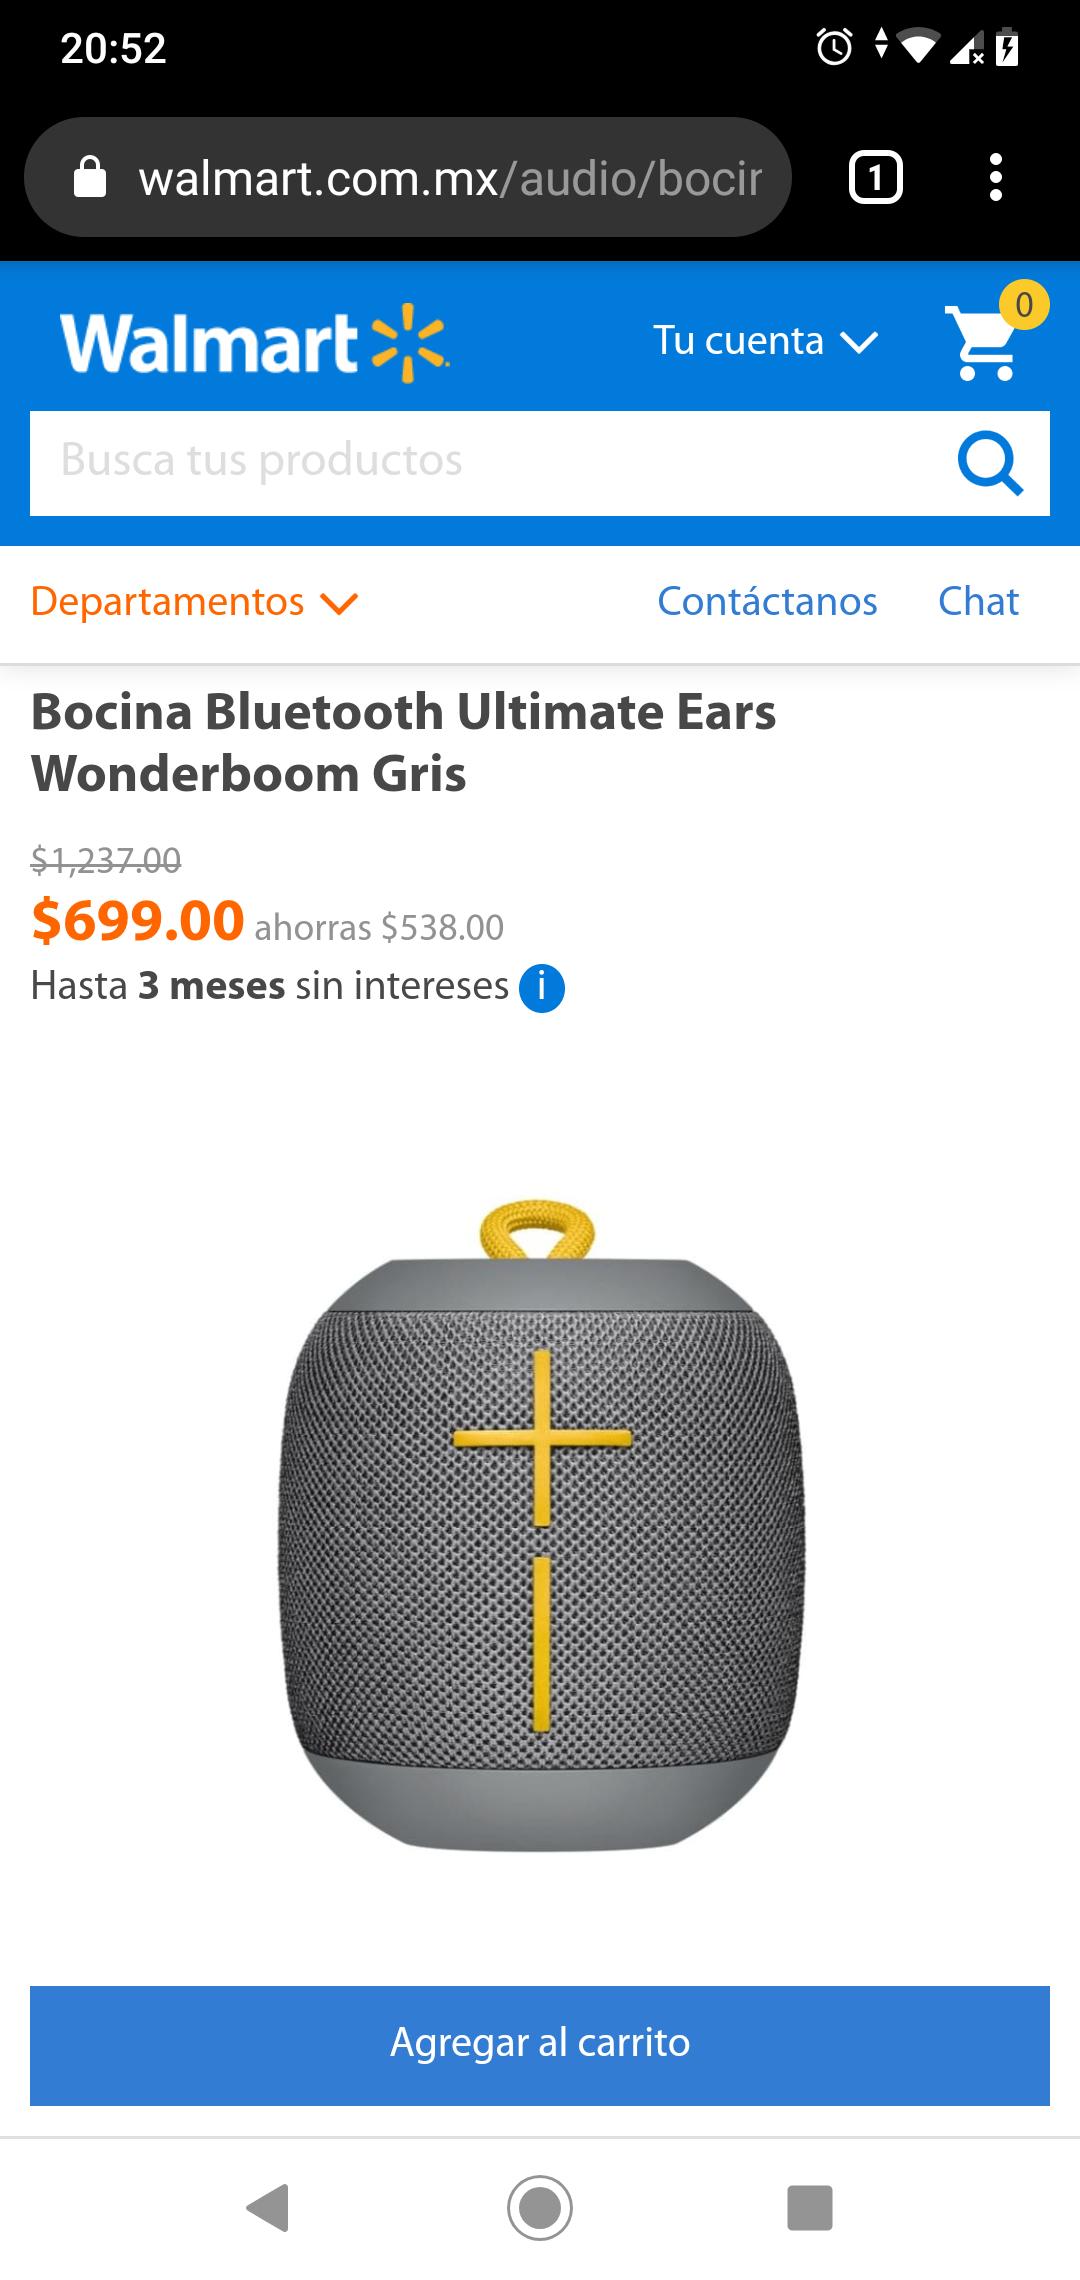 Walmart: Bocina Bluetooth Ultimate Ears Wonderboom Gris